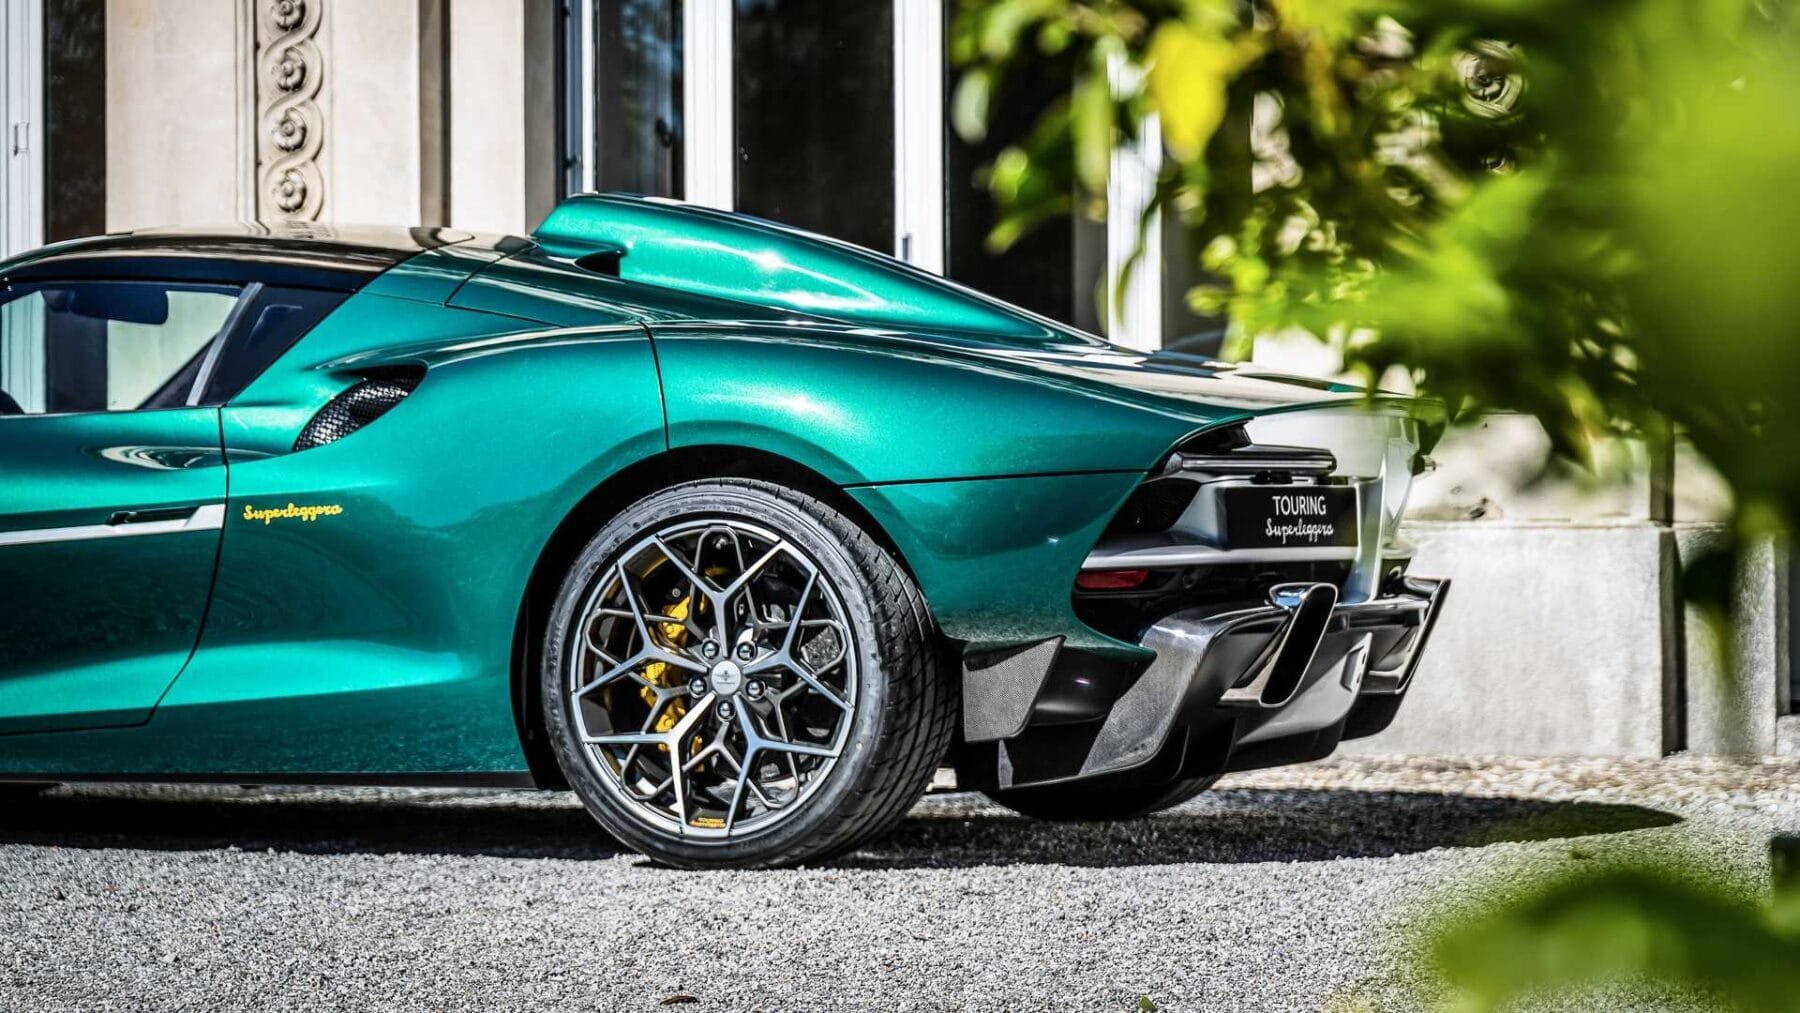 El Touring Superleggera Arese RH95 tiene un motor V8 de 720 CV